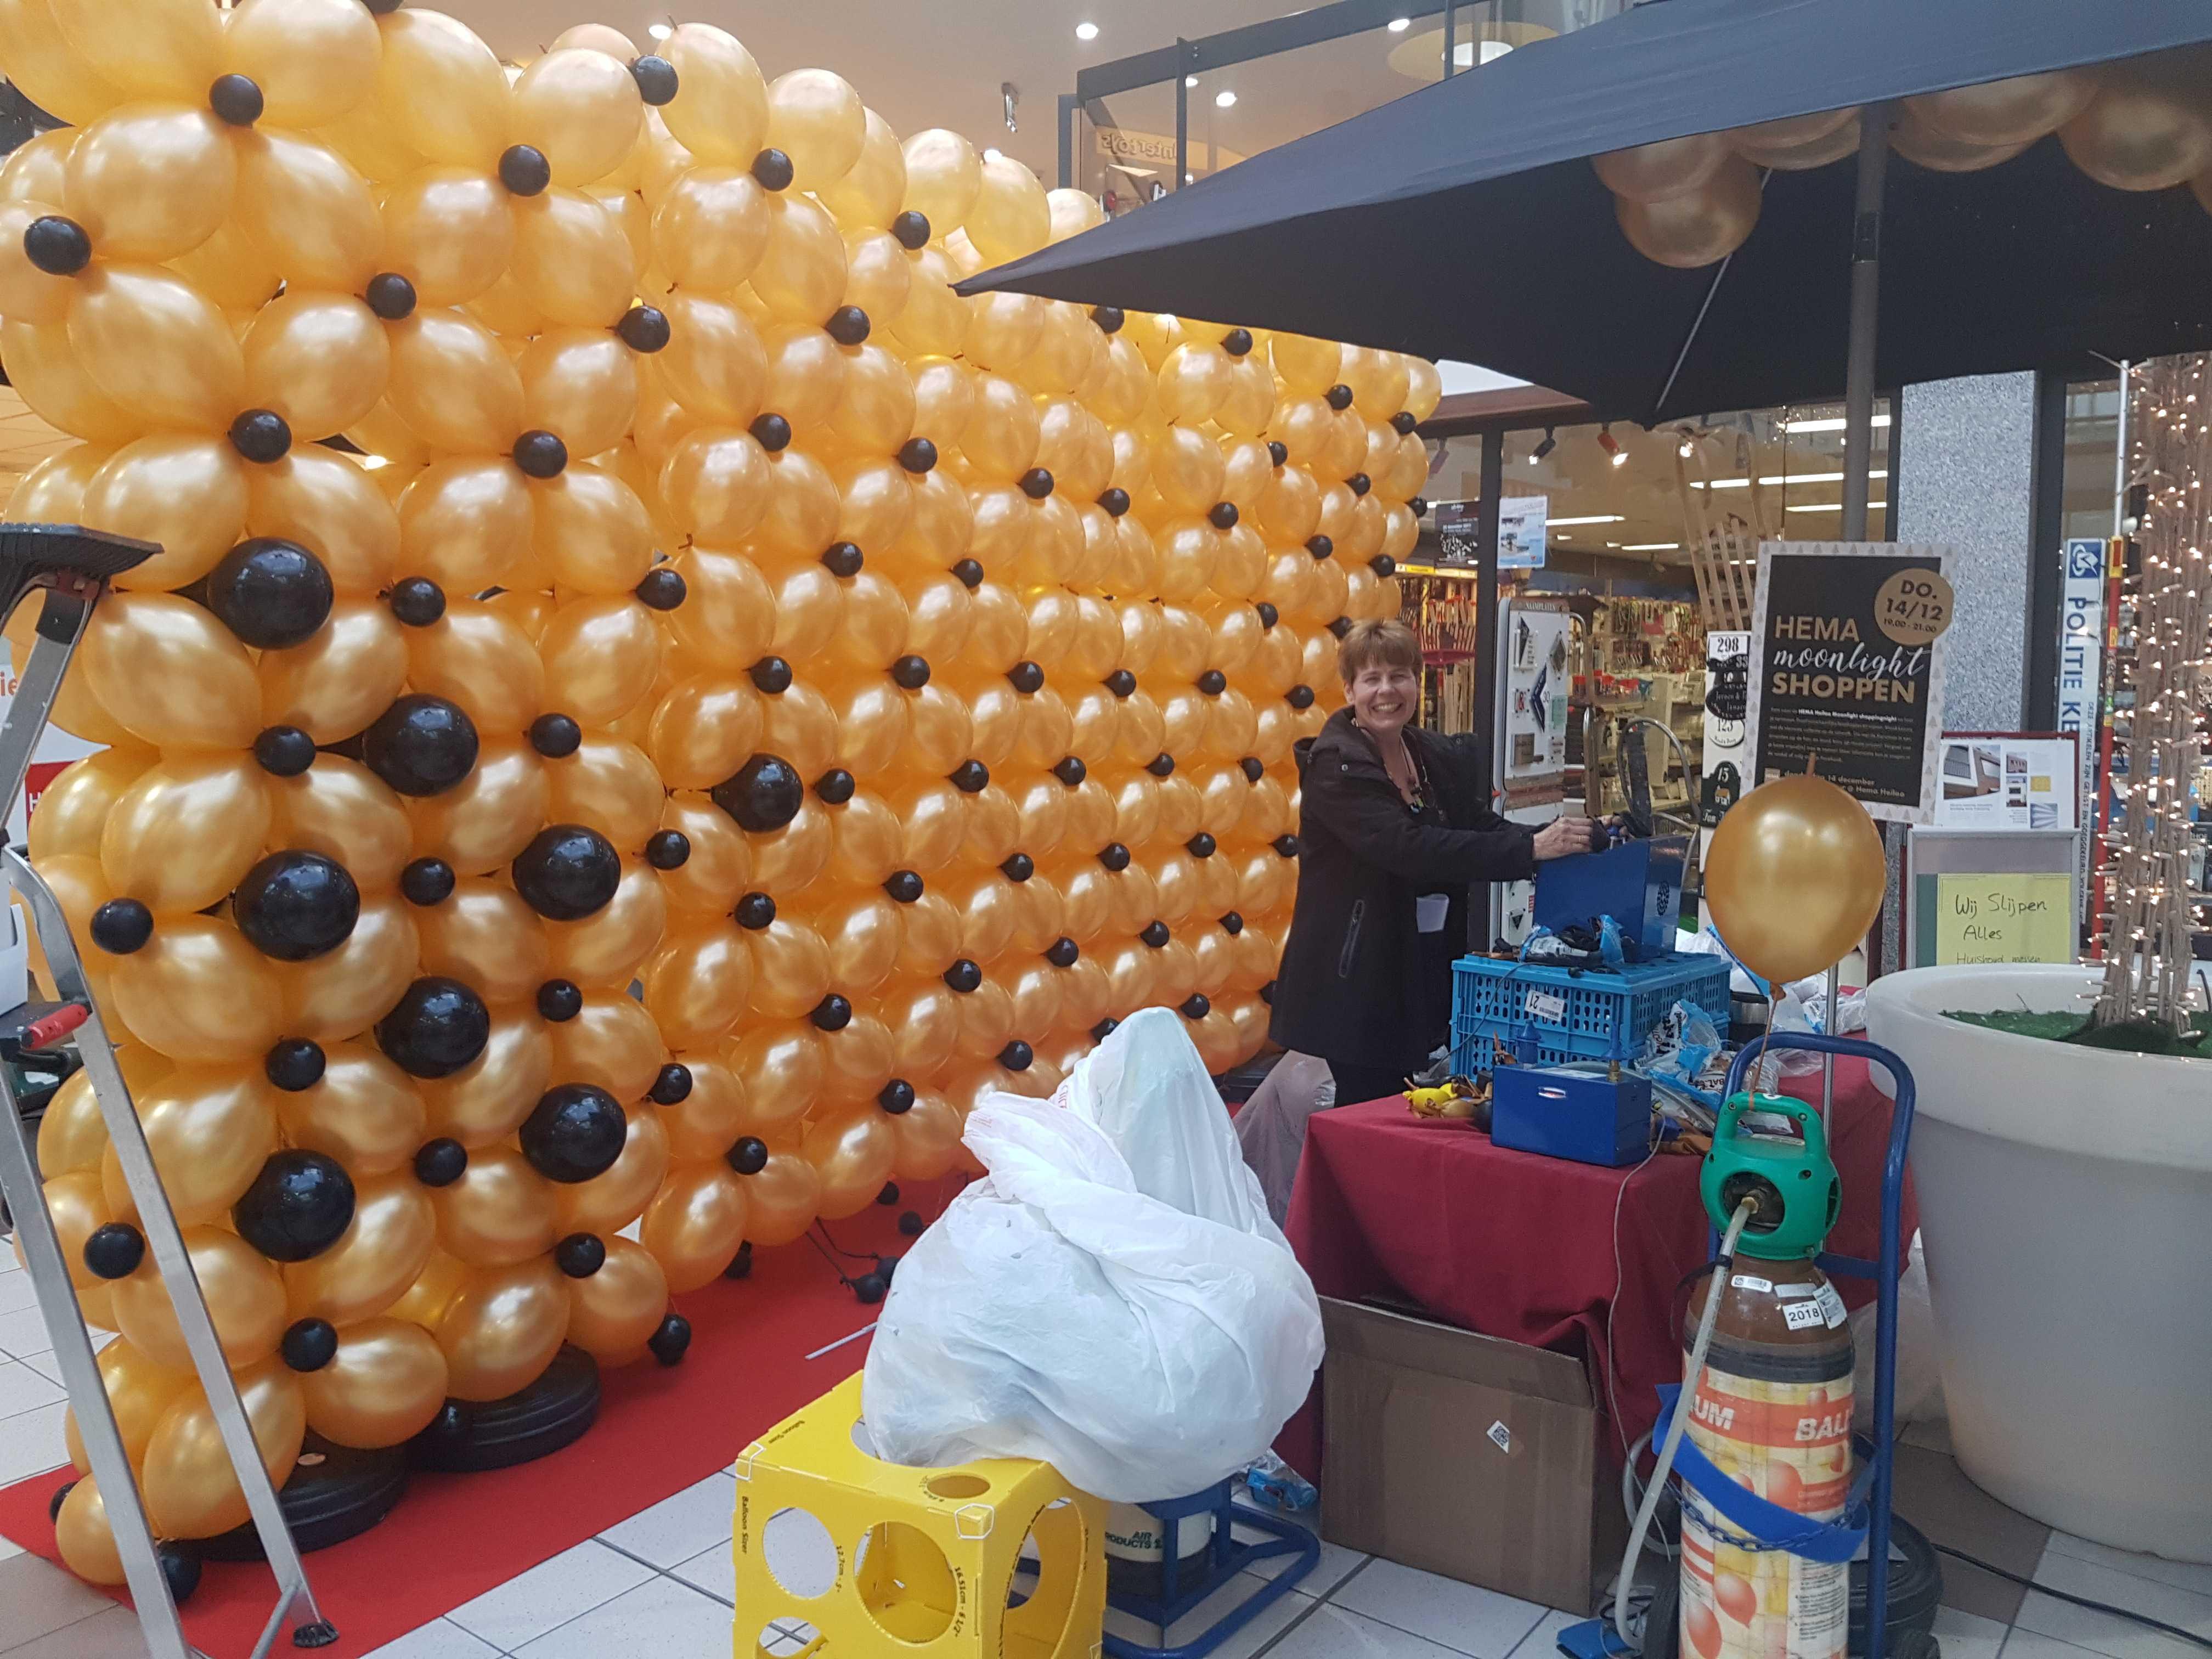 omhoog-stijgende-ballonwand-helium-spectaculaire-opening-HEMA-Heiloo